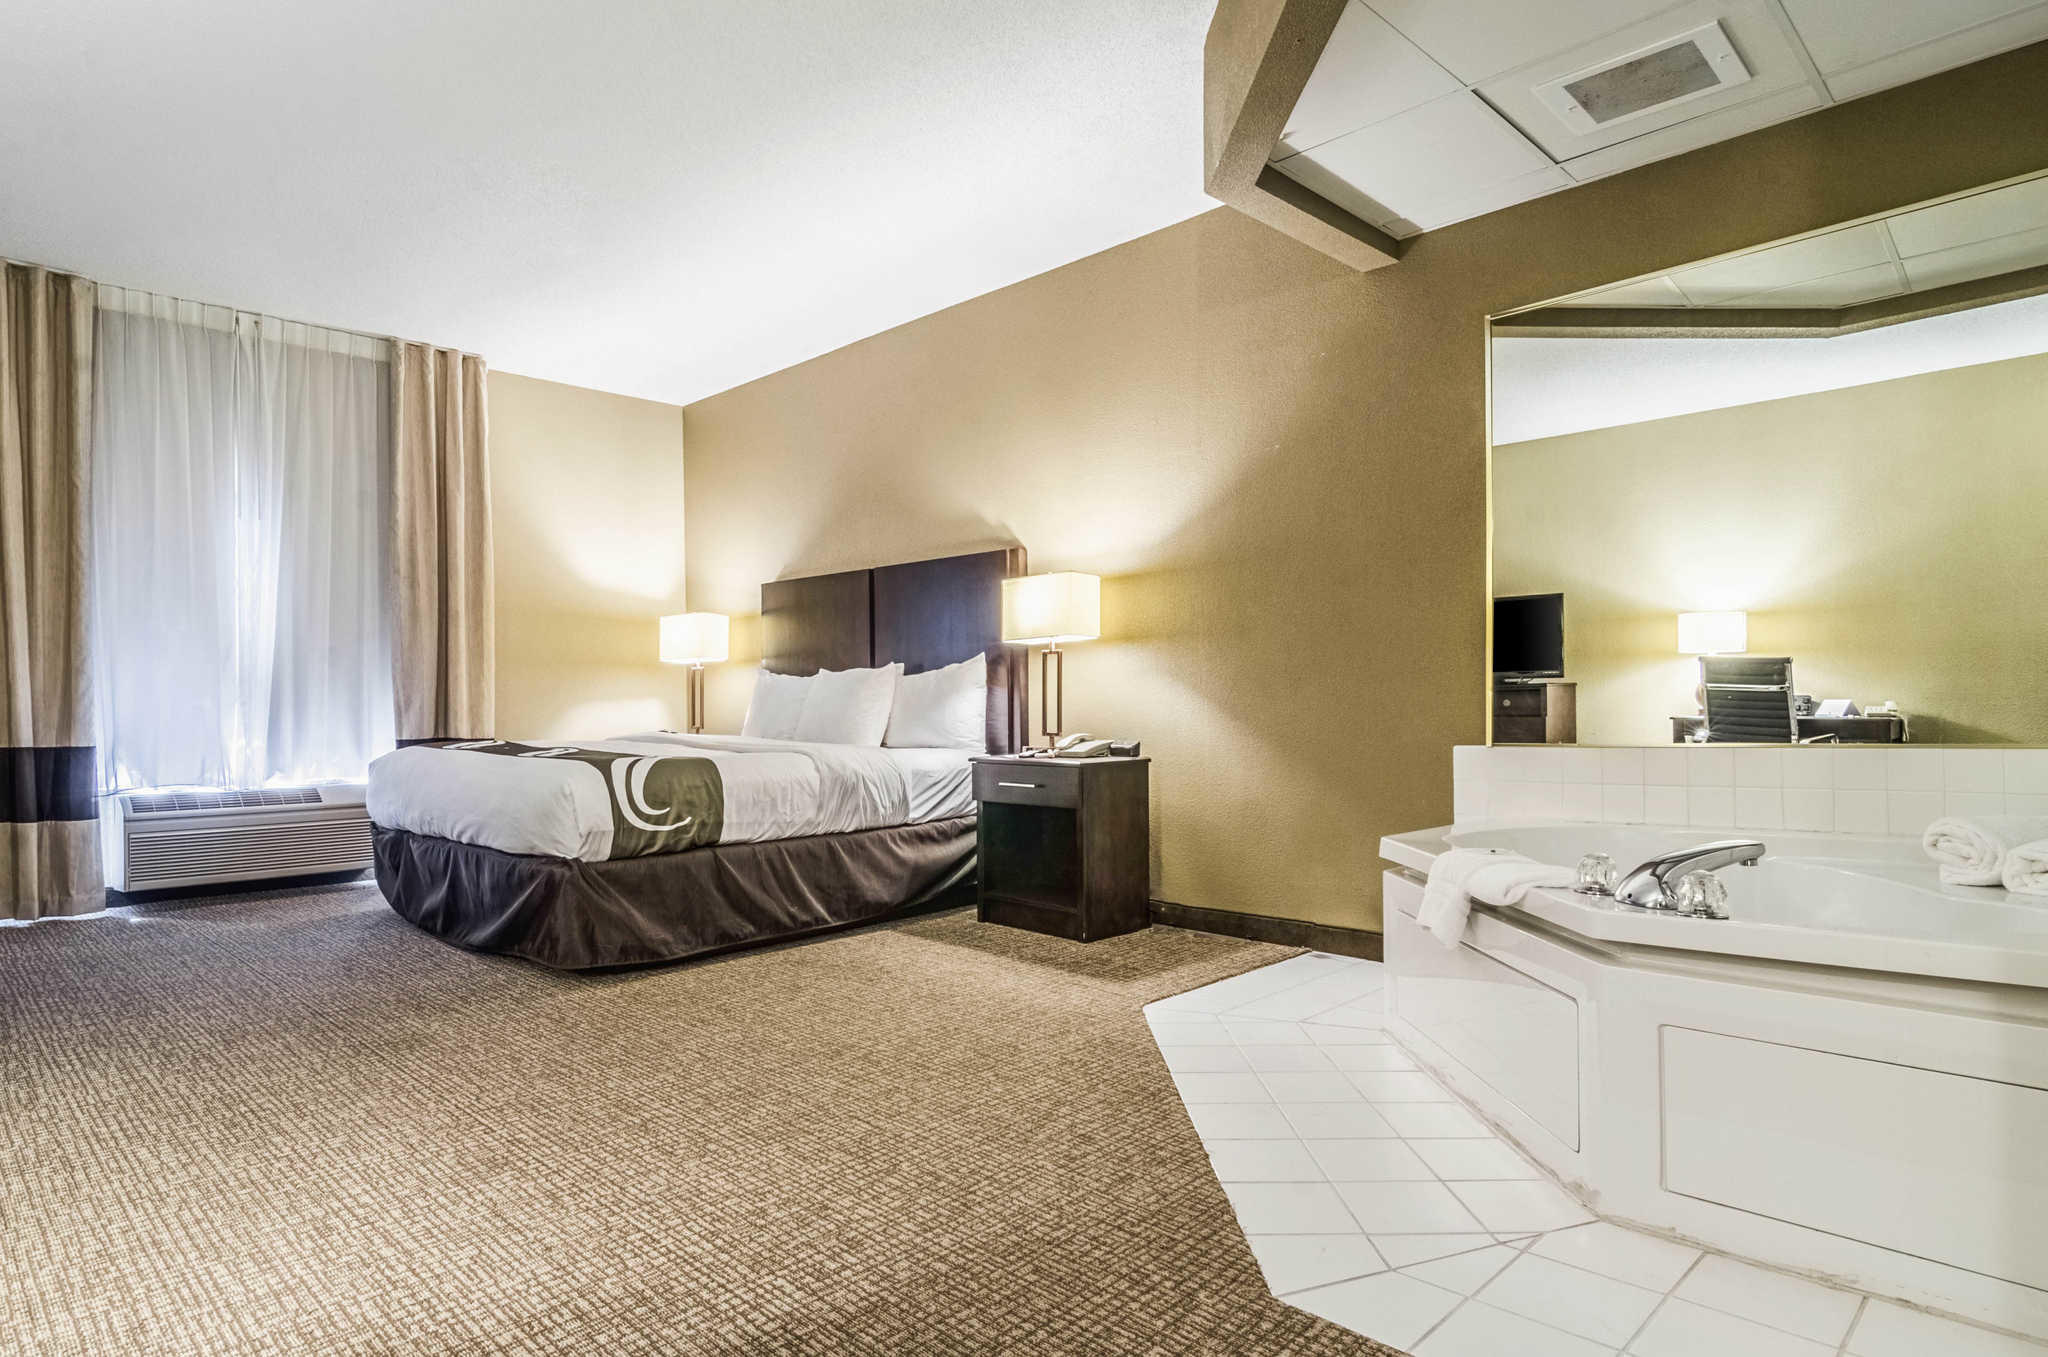 Quality Suites image 11